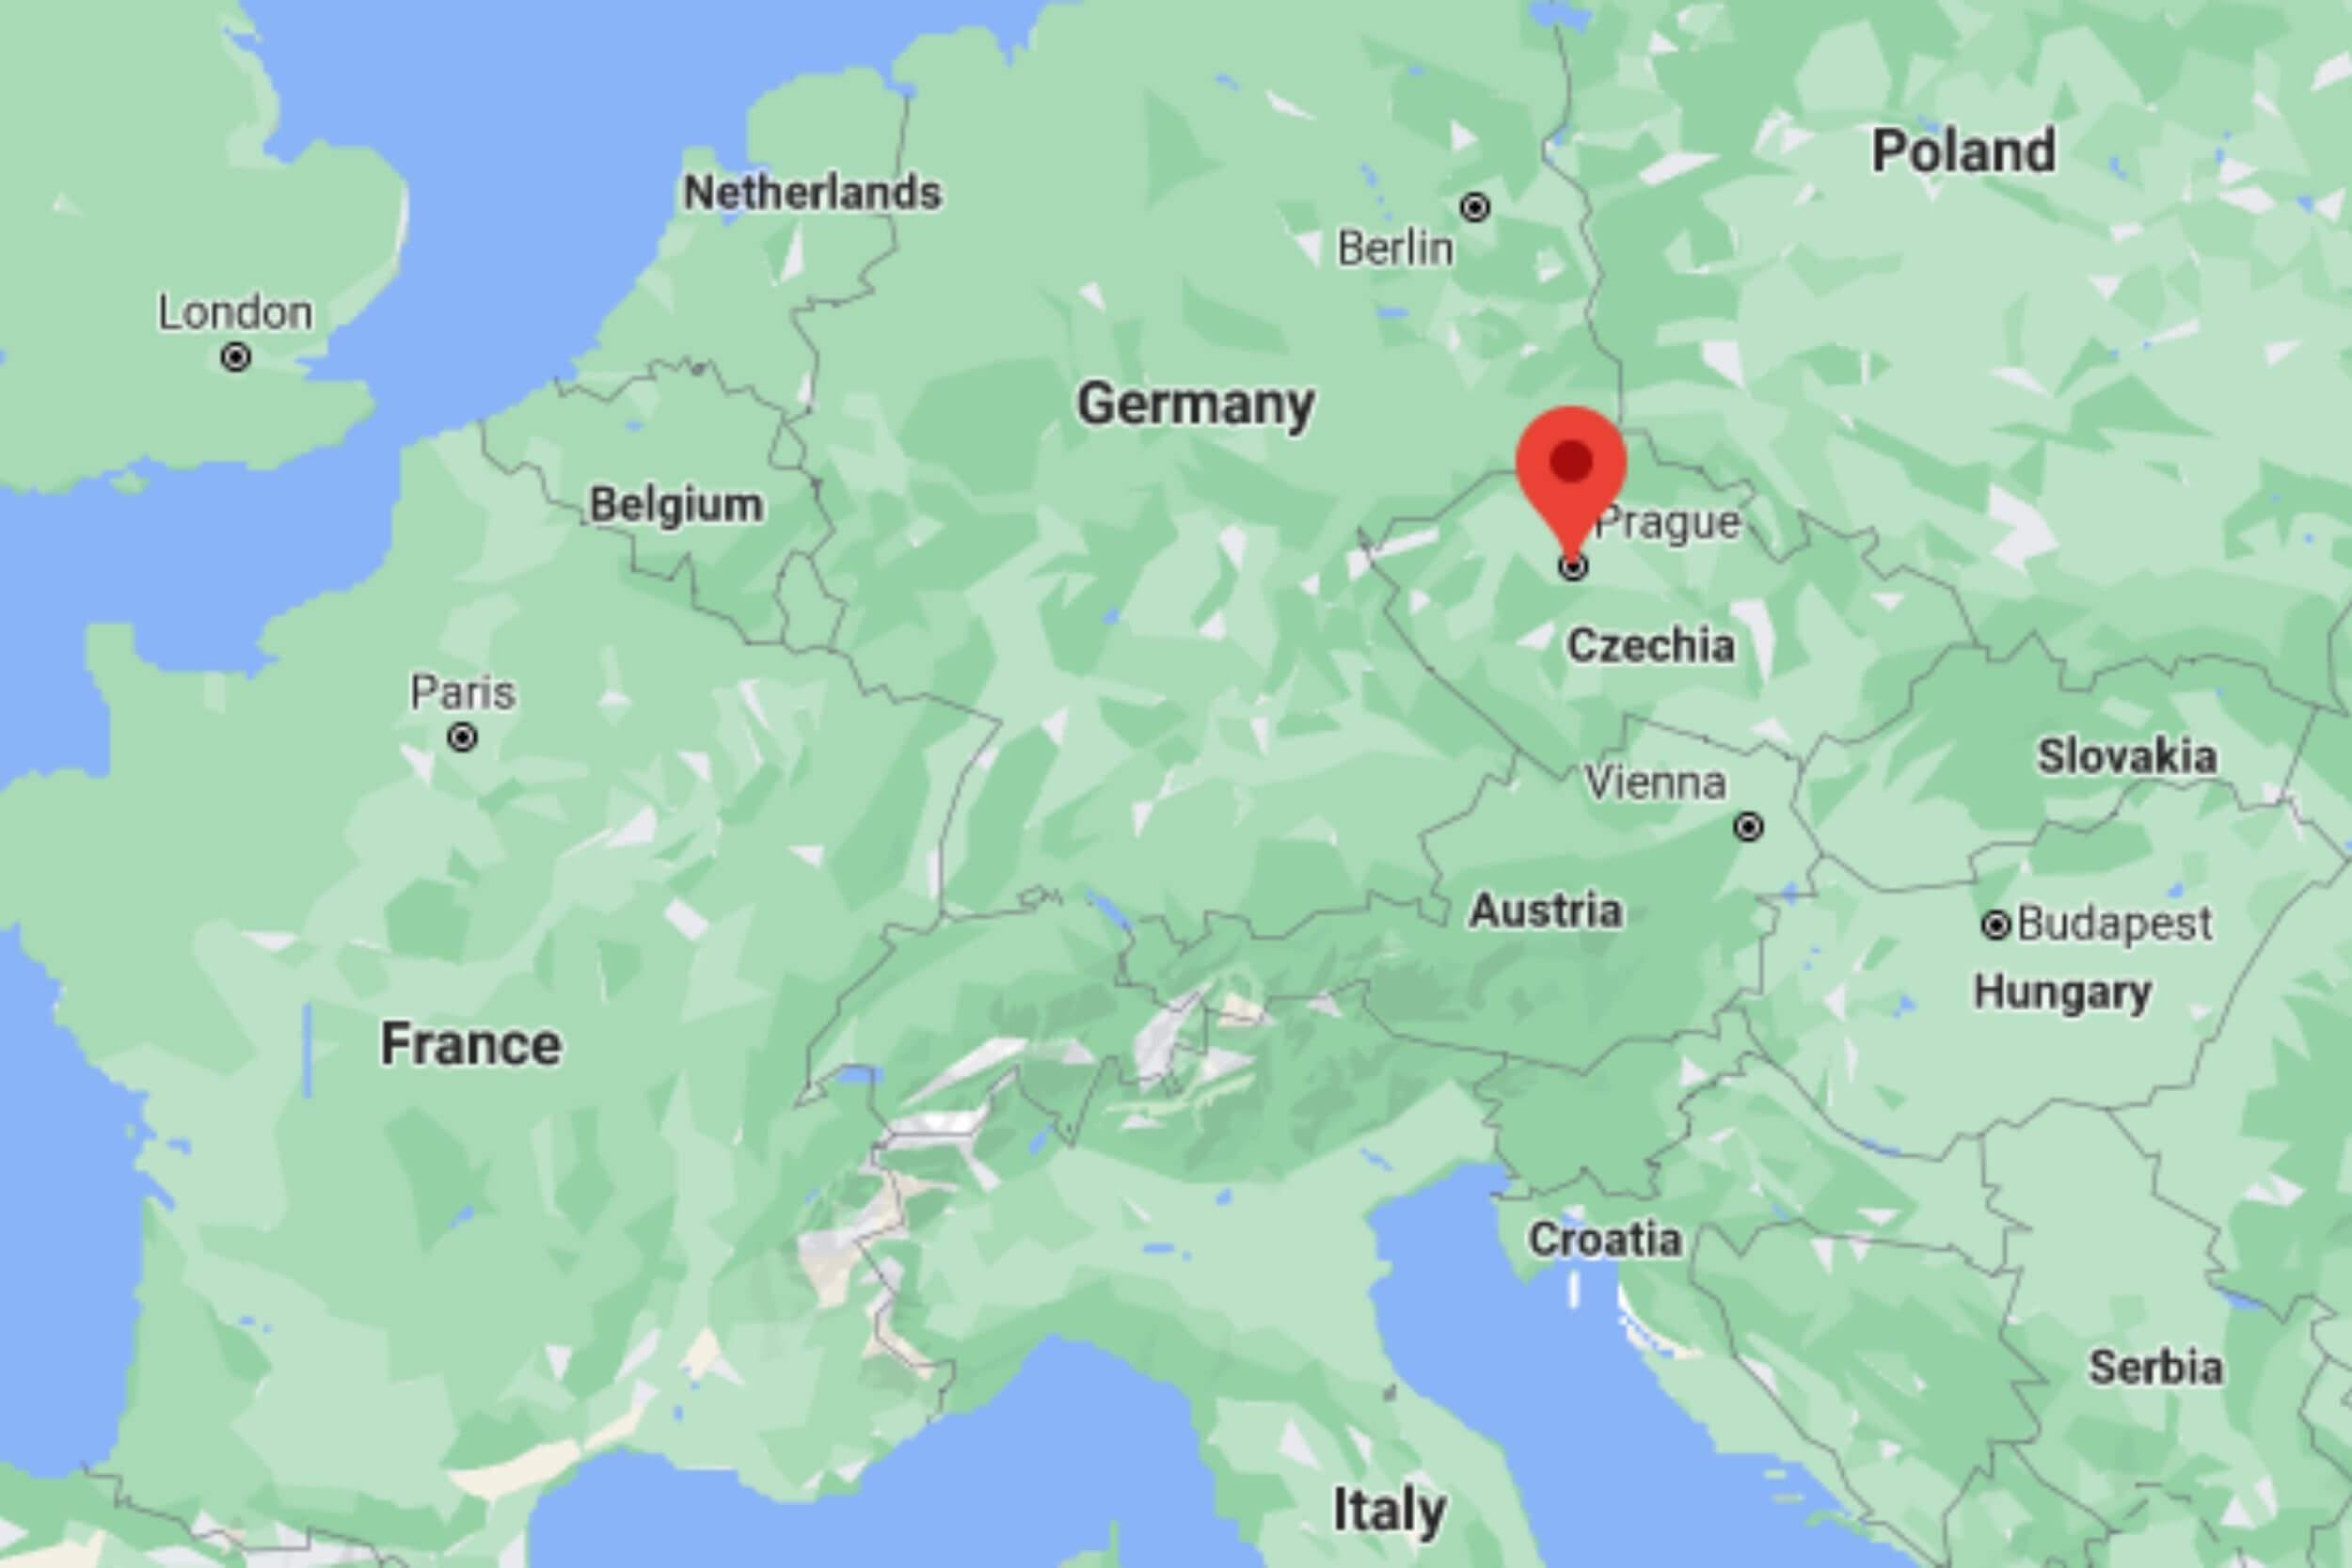 Prague on map